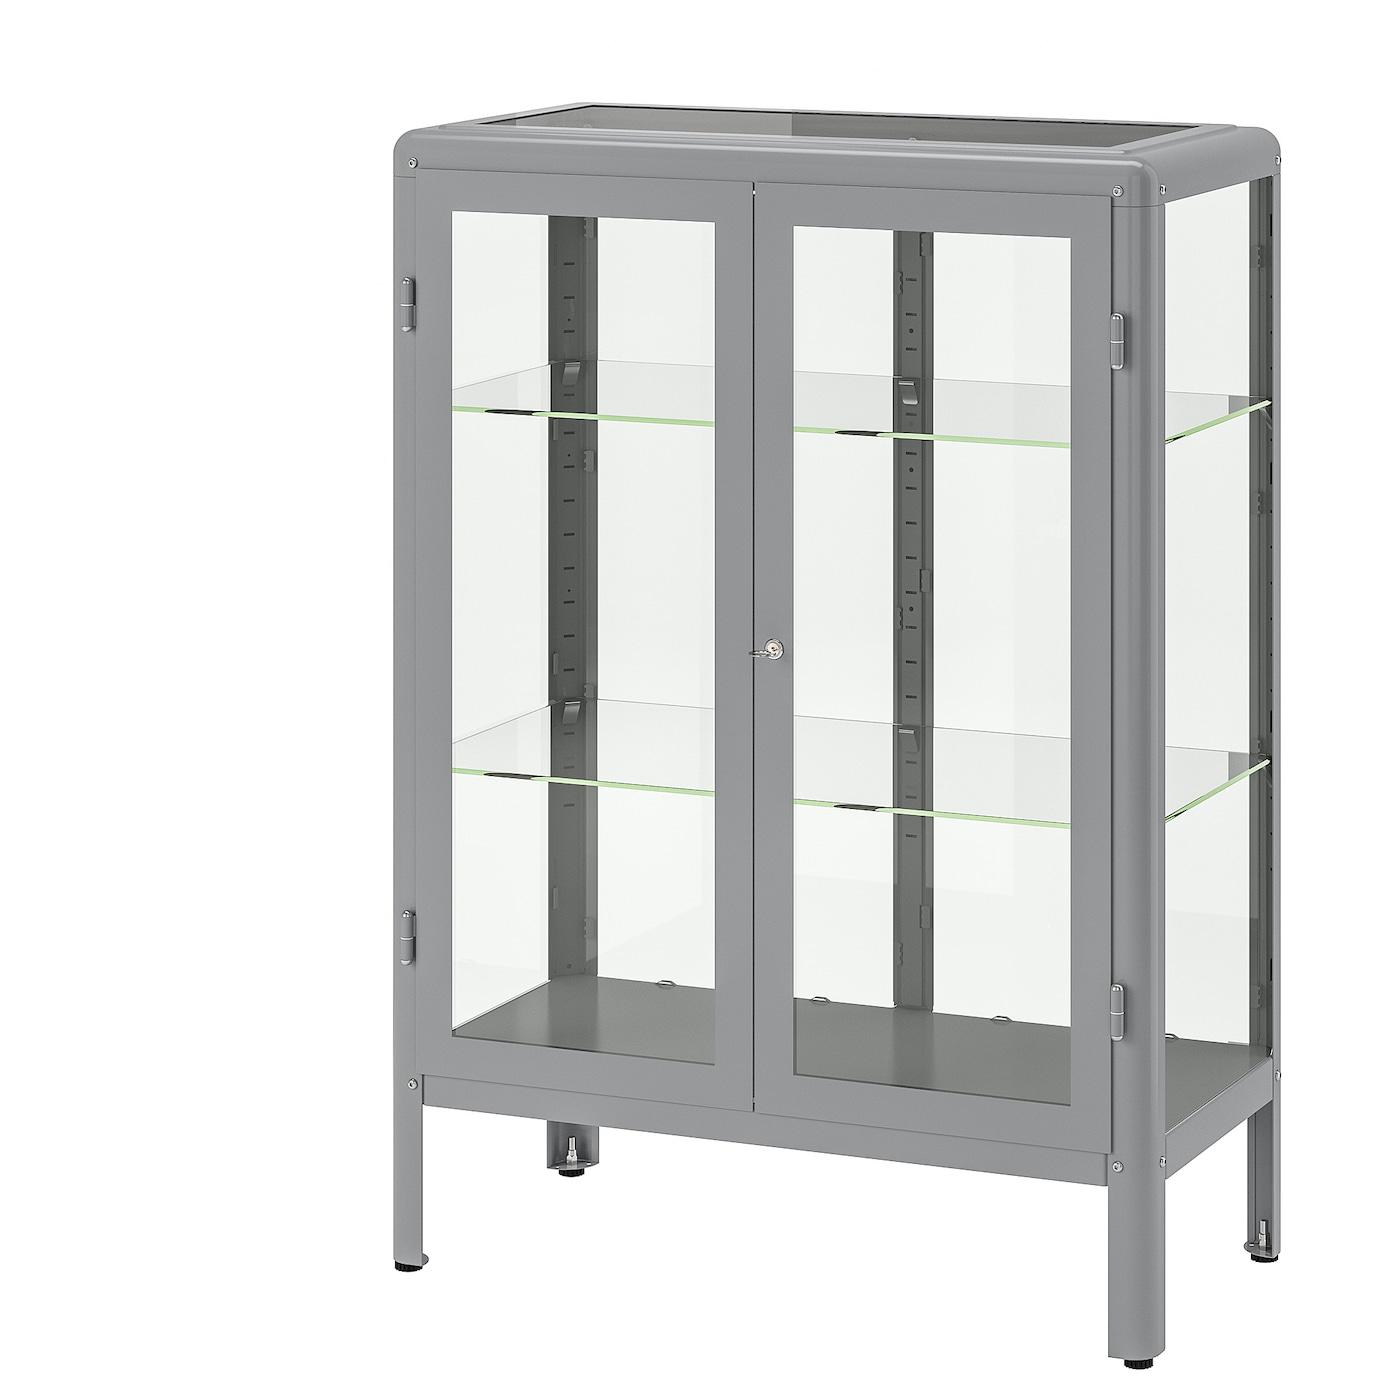 fabrik r vitrine gris 81 x 113 cm ikea. Black Bedroom Furniture Sets. Home Design Ideas